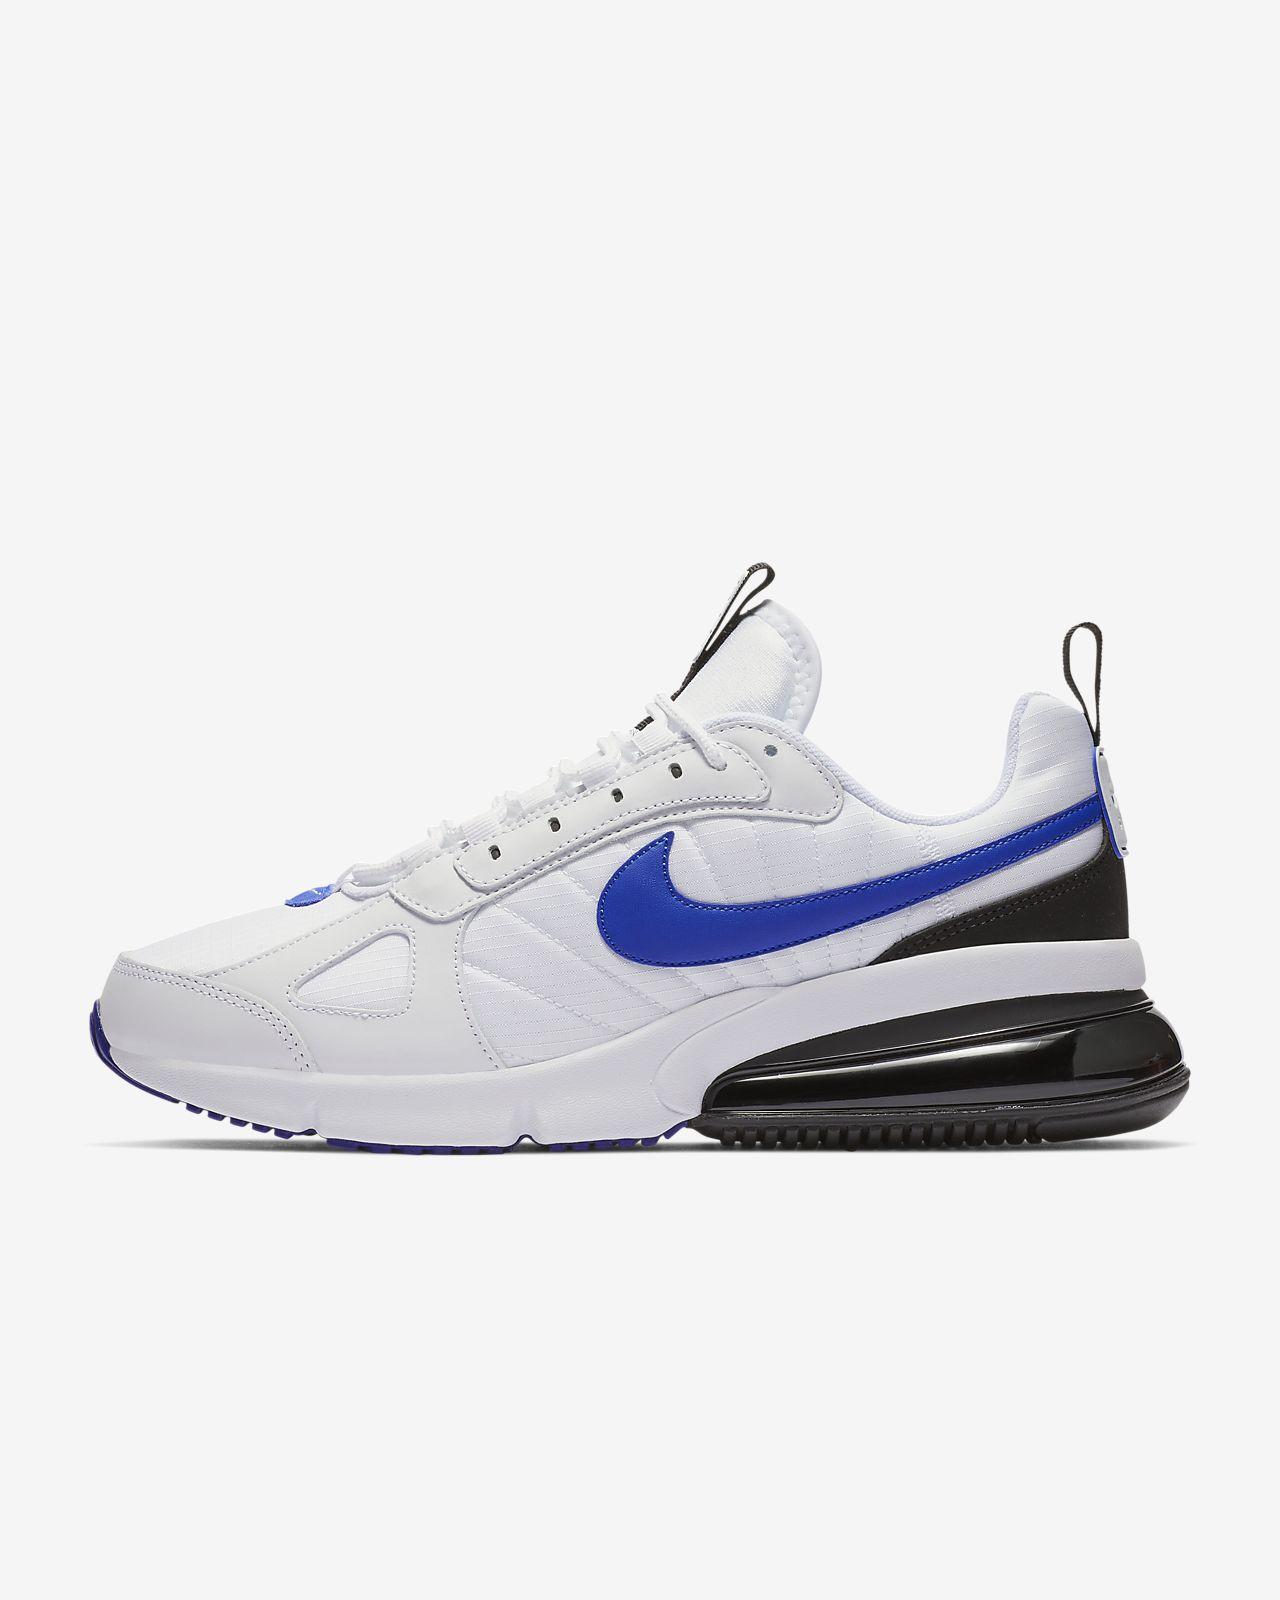 buy online 9103e 0b85d ... usa nike air max 270 futura sko til herre 65642 e9560